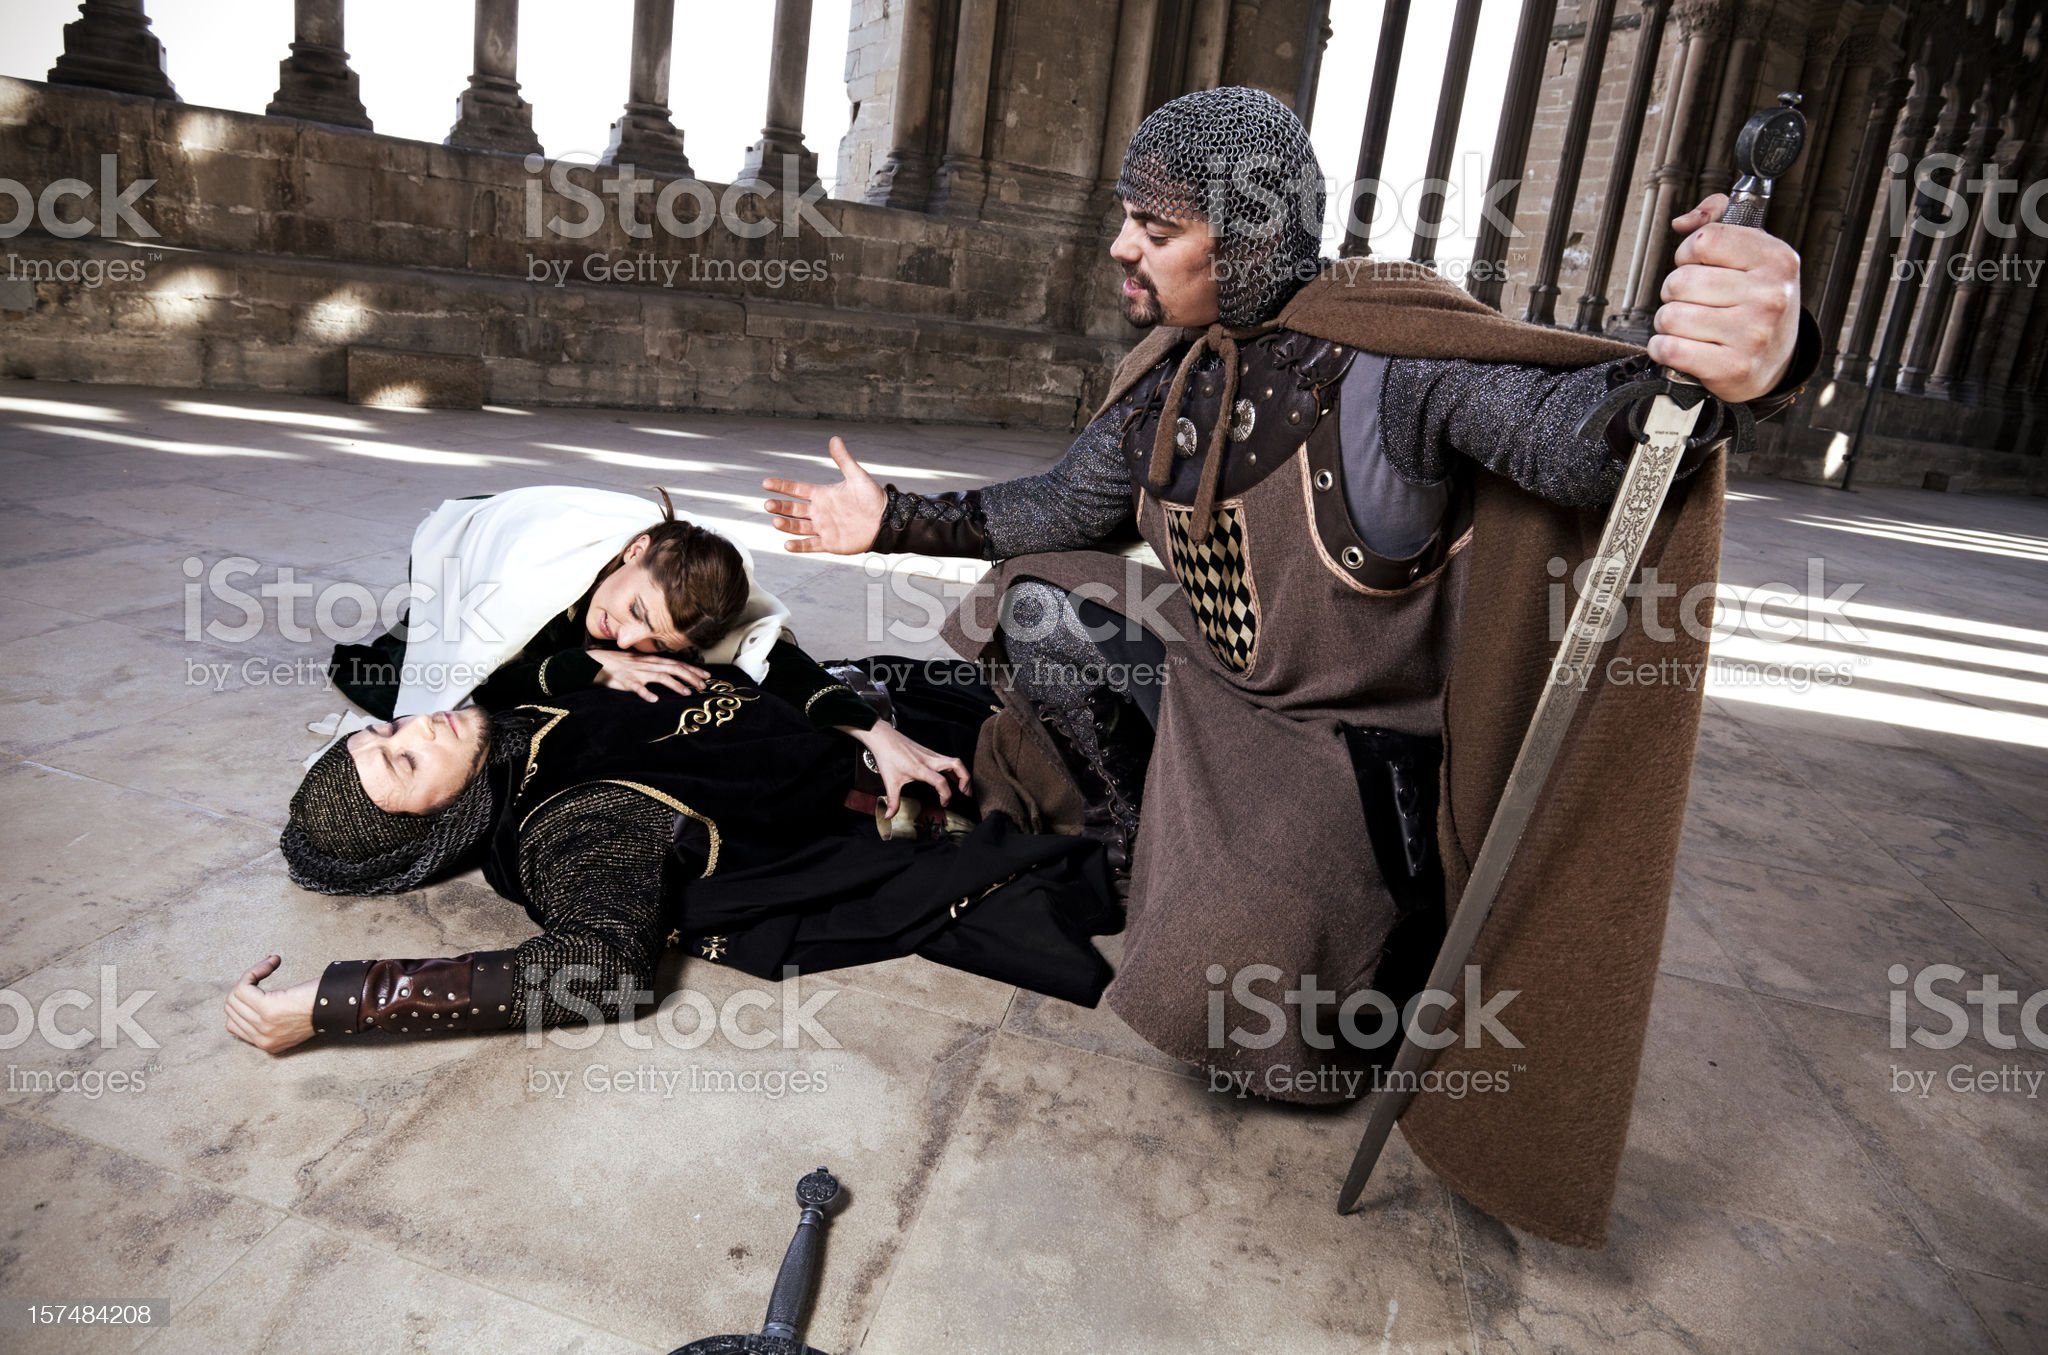 Gloating knight royalty-free stock photo